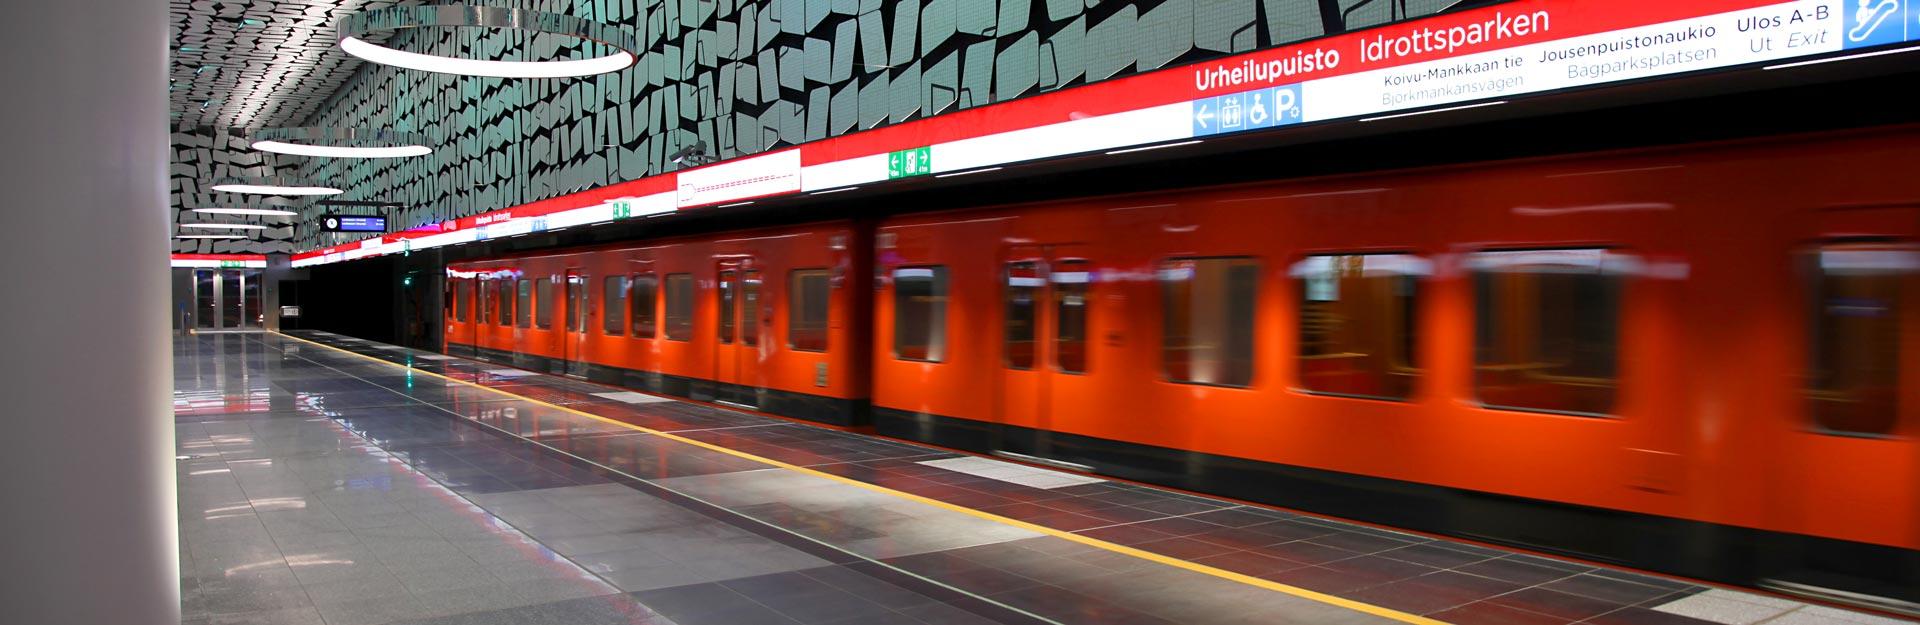 En tunnelbana vid Indrottsparkens metrostation.